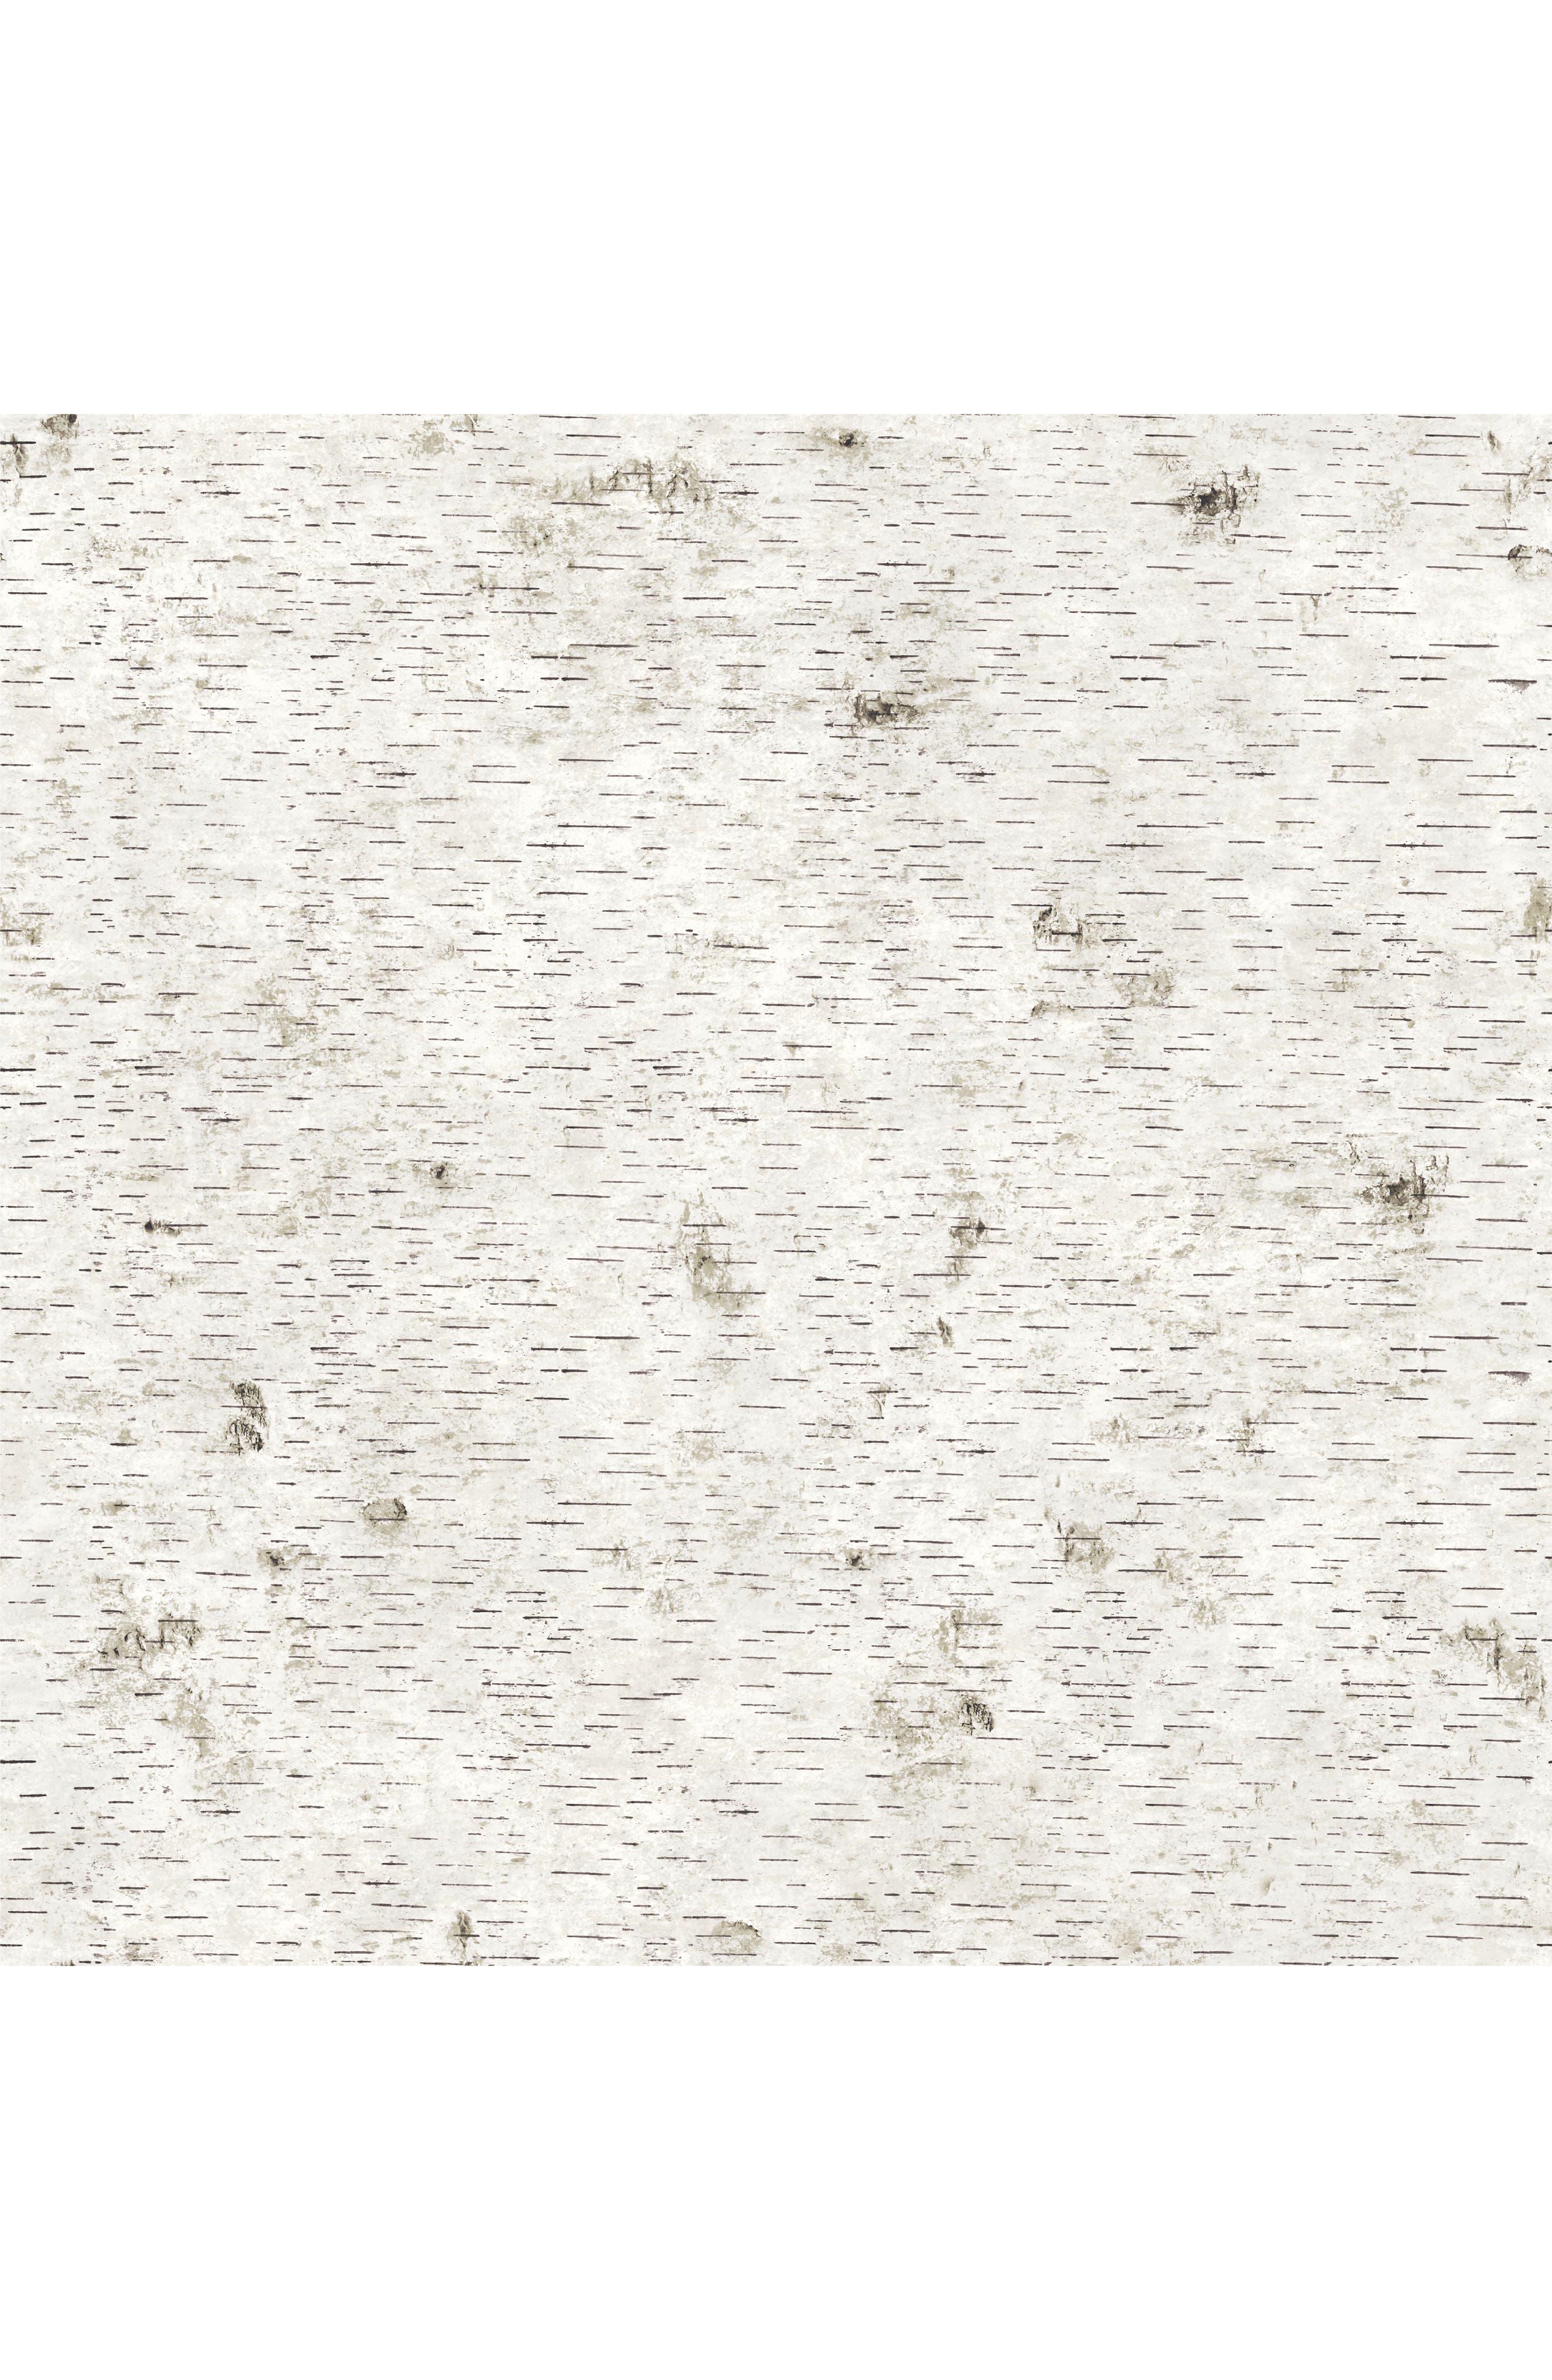 Tempaper Birchy Barky Self-Adhesive Vinyl Wallpaper